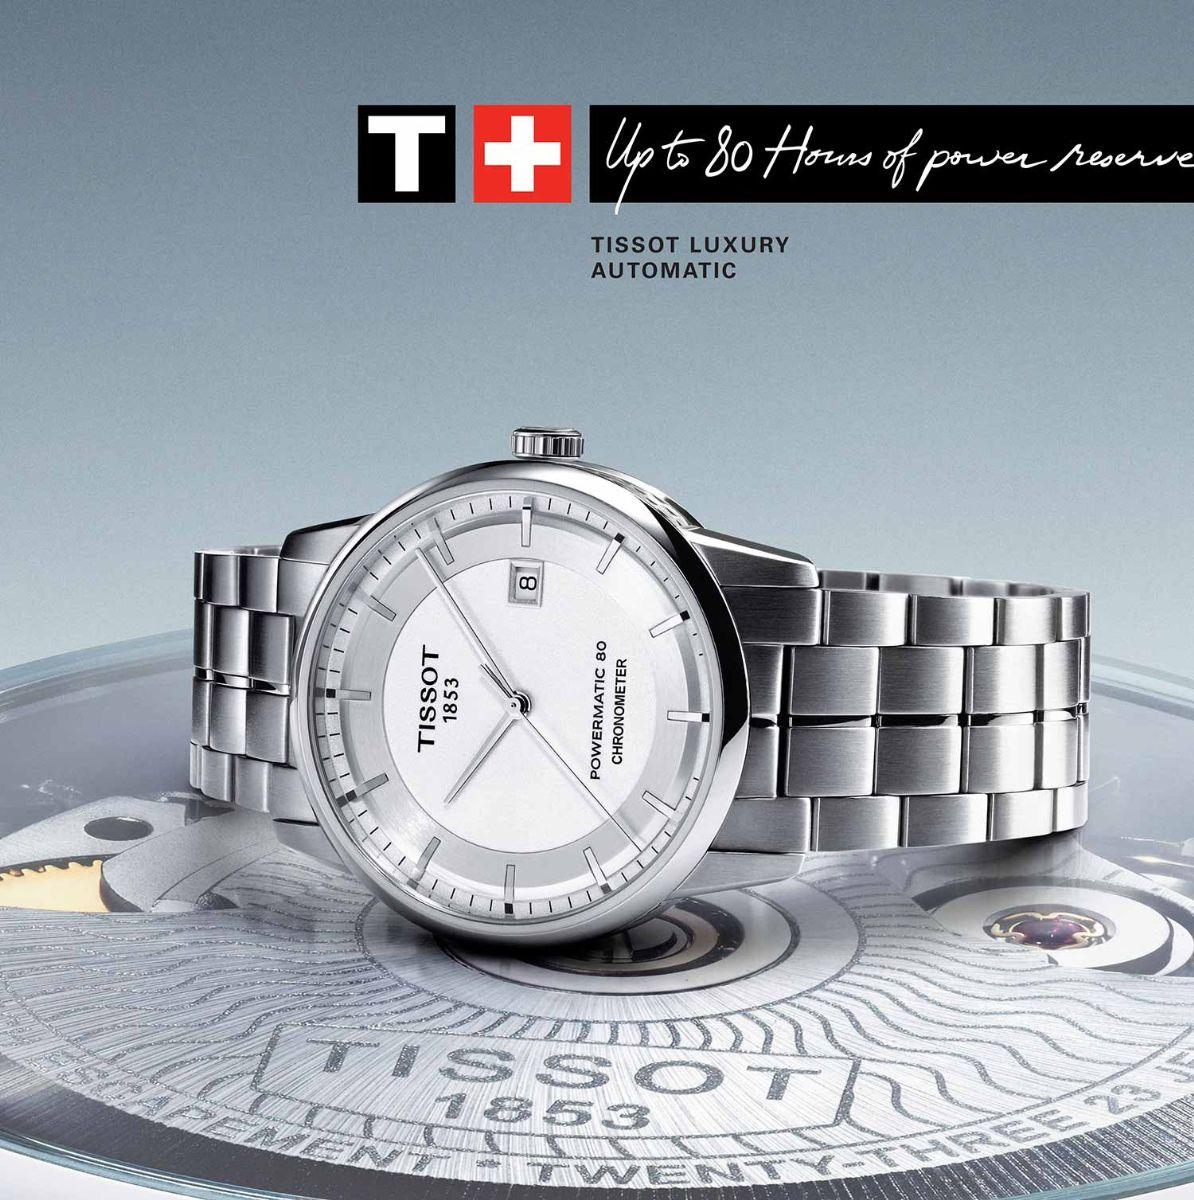 Đồng hồ Tissot Luxury Automatic